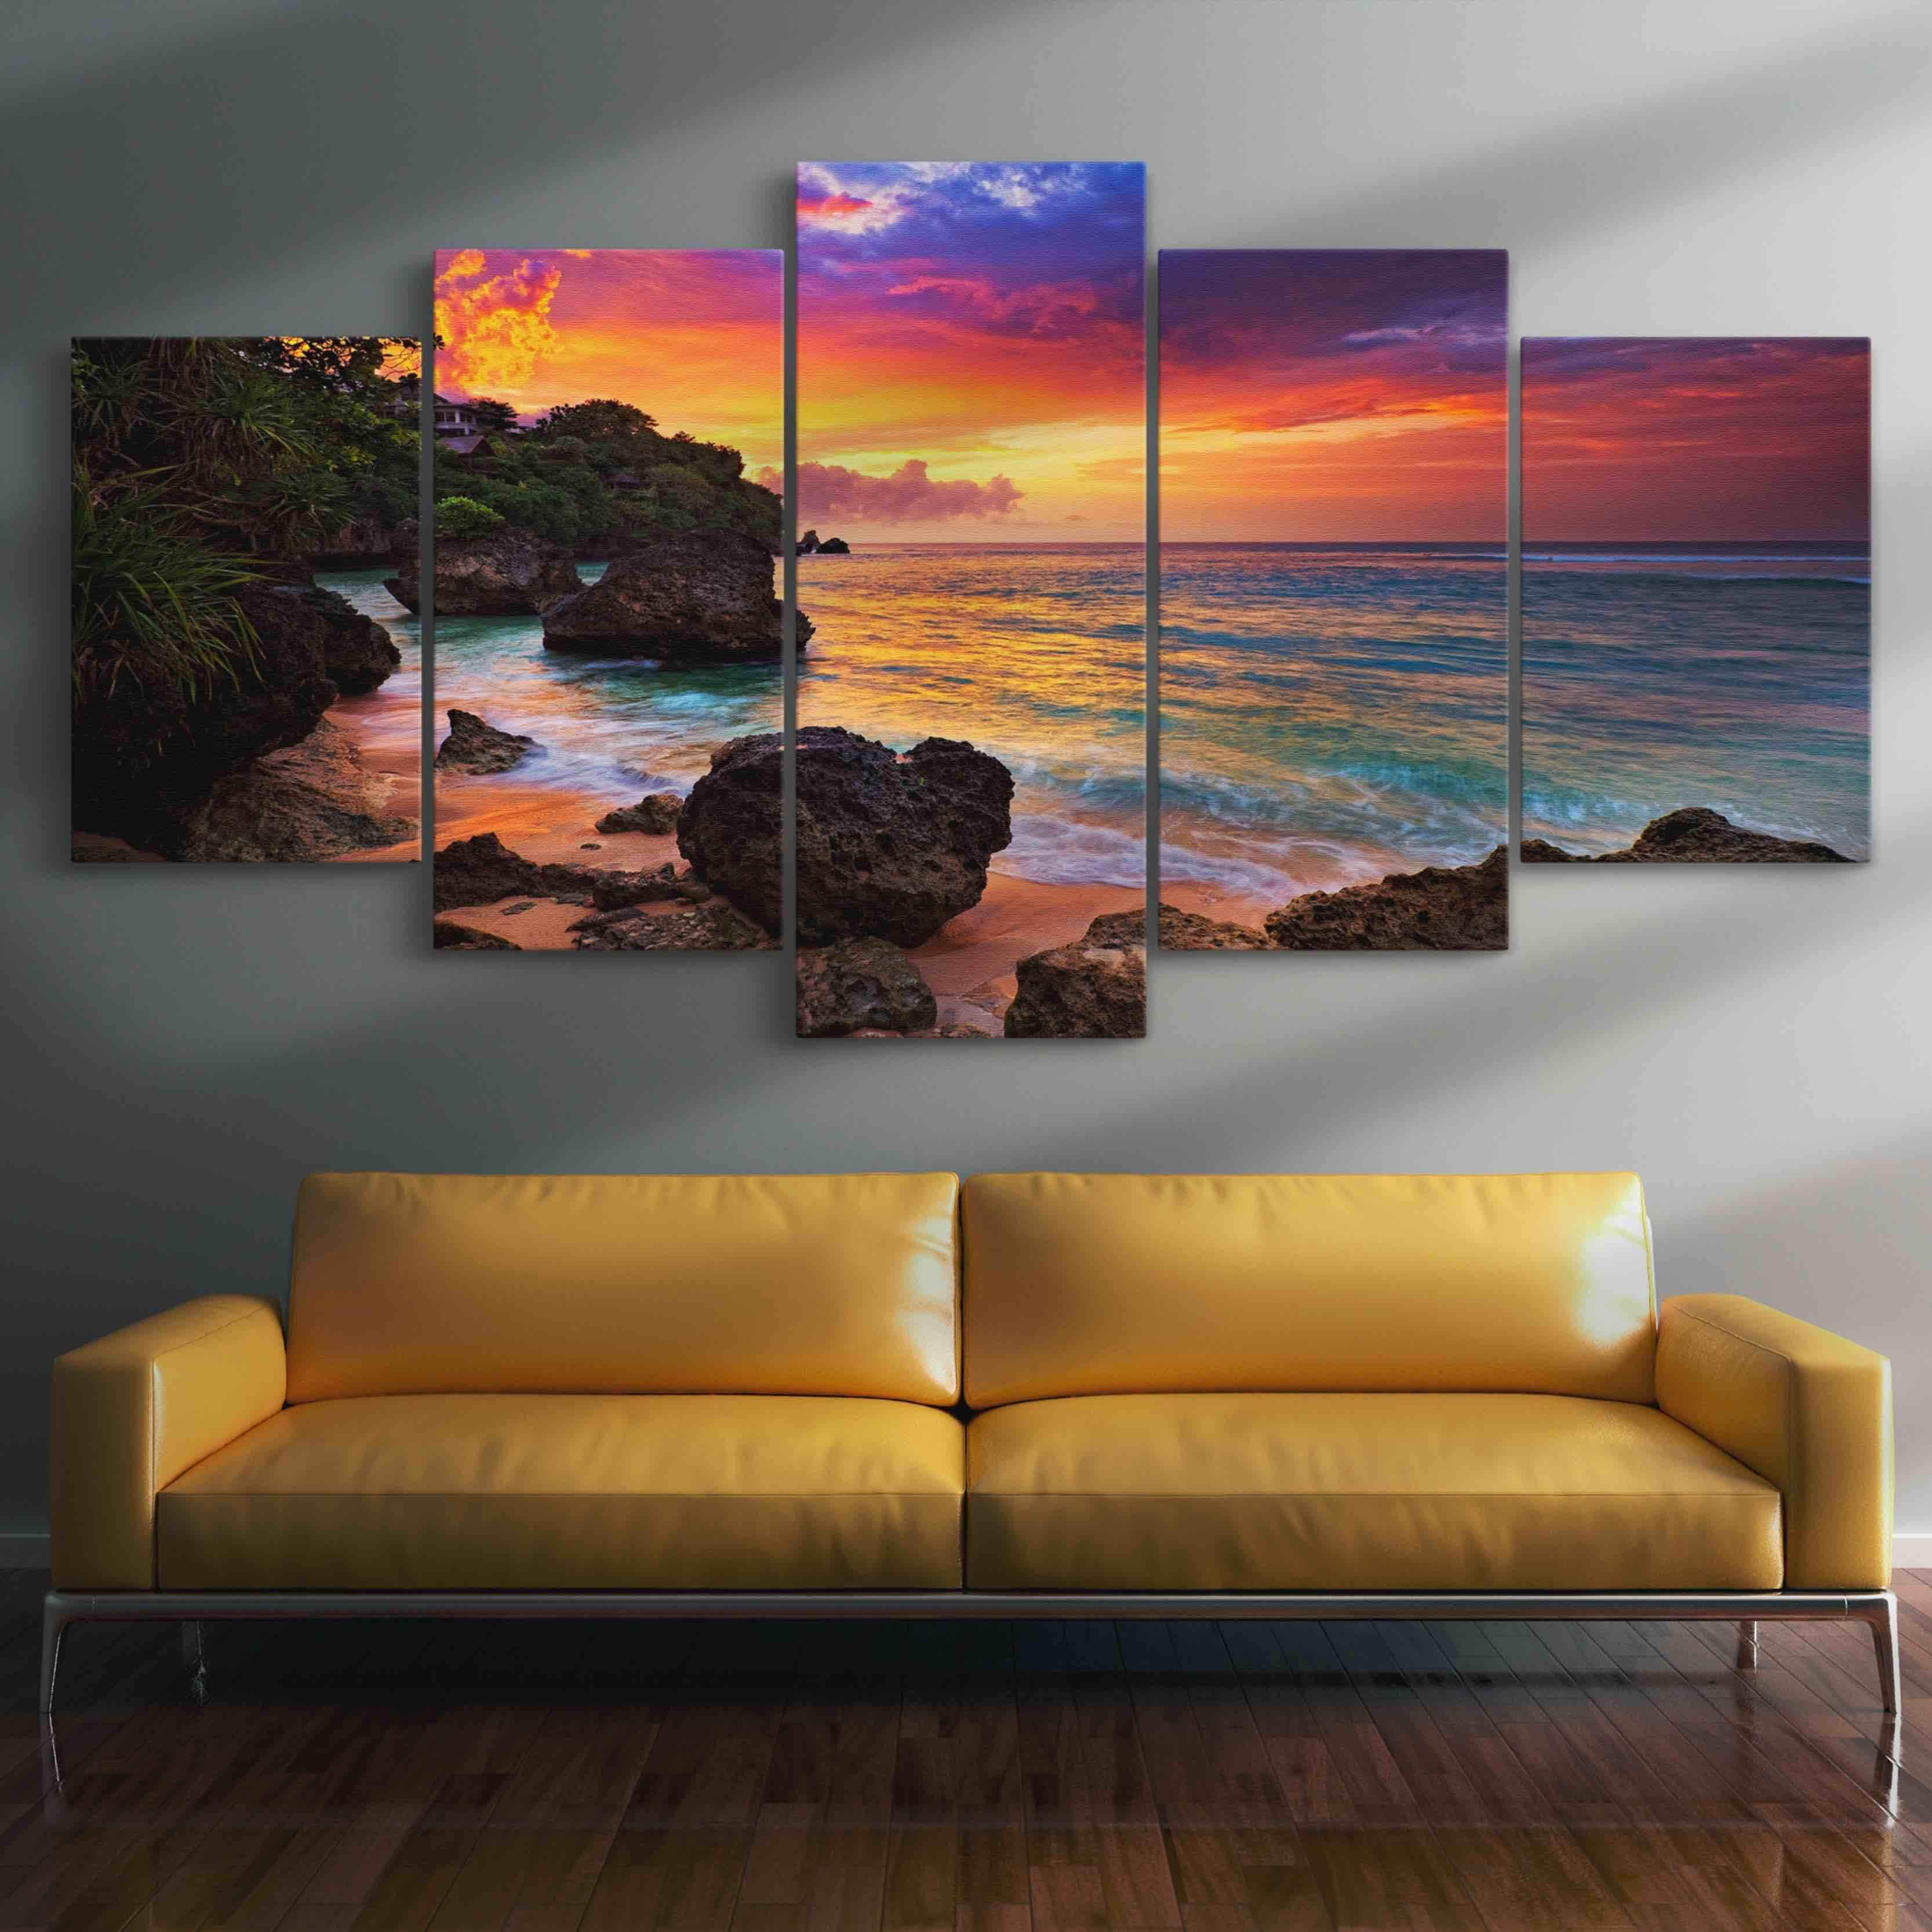 Sunset Beach Romance 5 panel wall art canvas